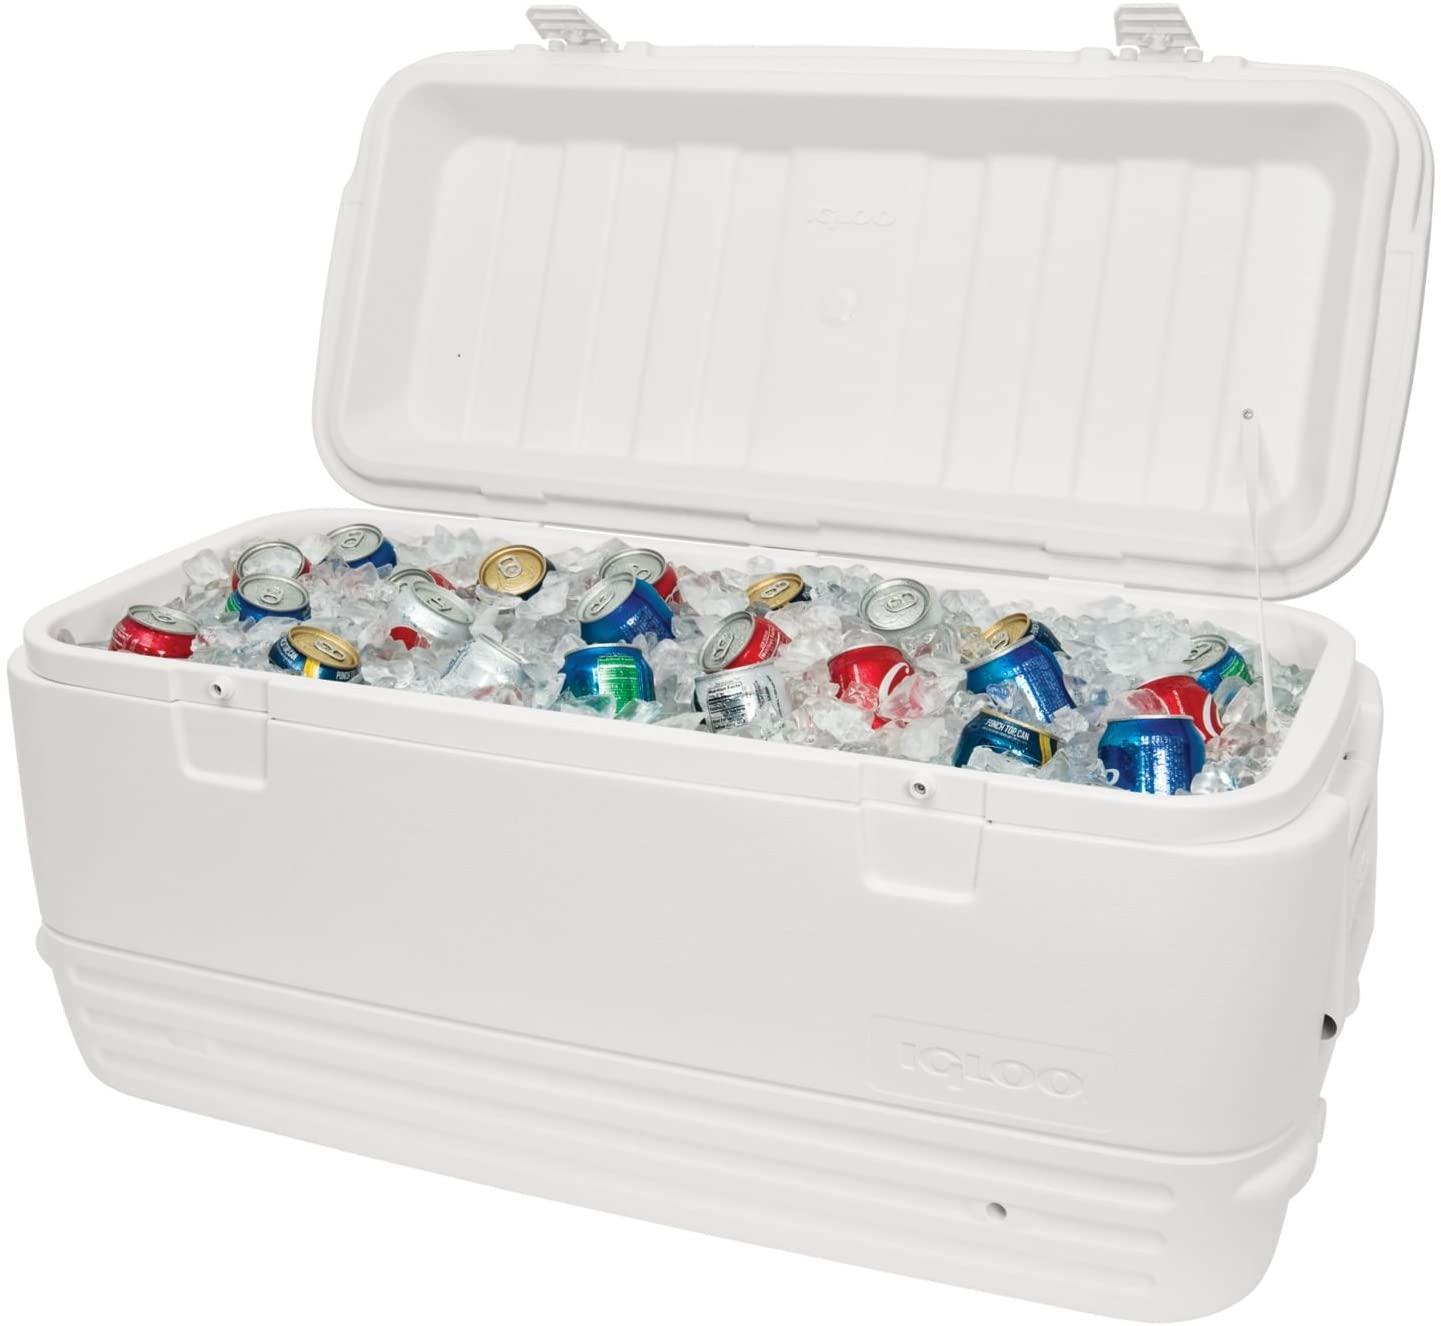 Igloo Polar Cooler